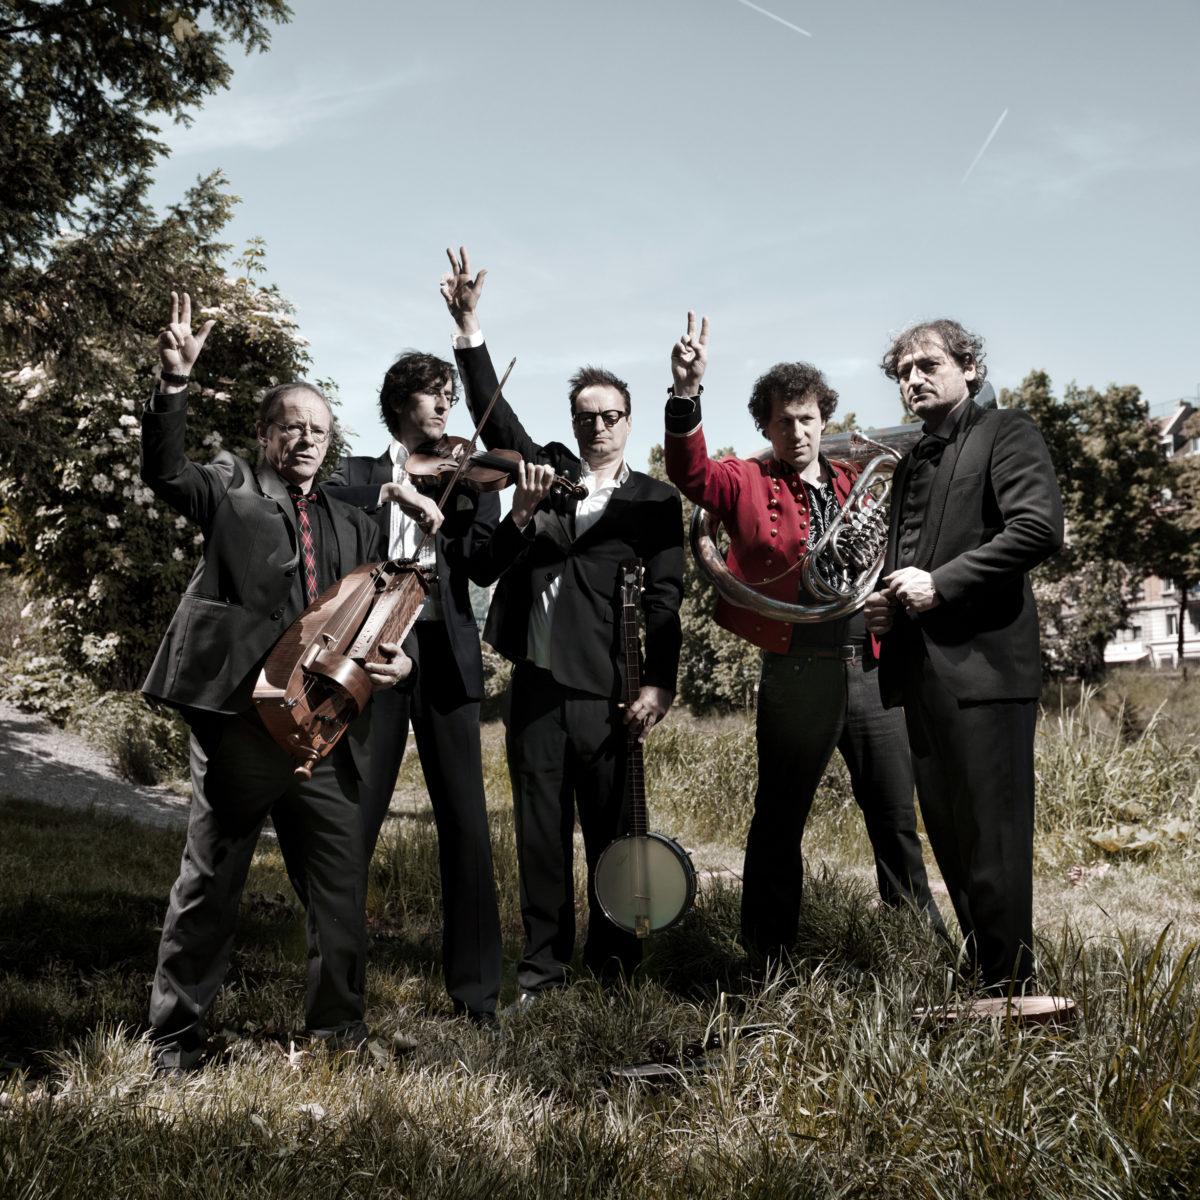 DEAD BROTHERS (Zwi – Voodoo Rhythm) + Rommelhond